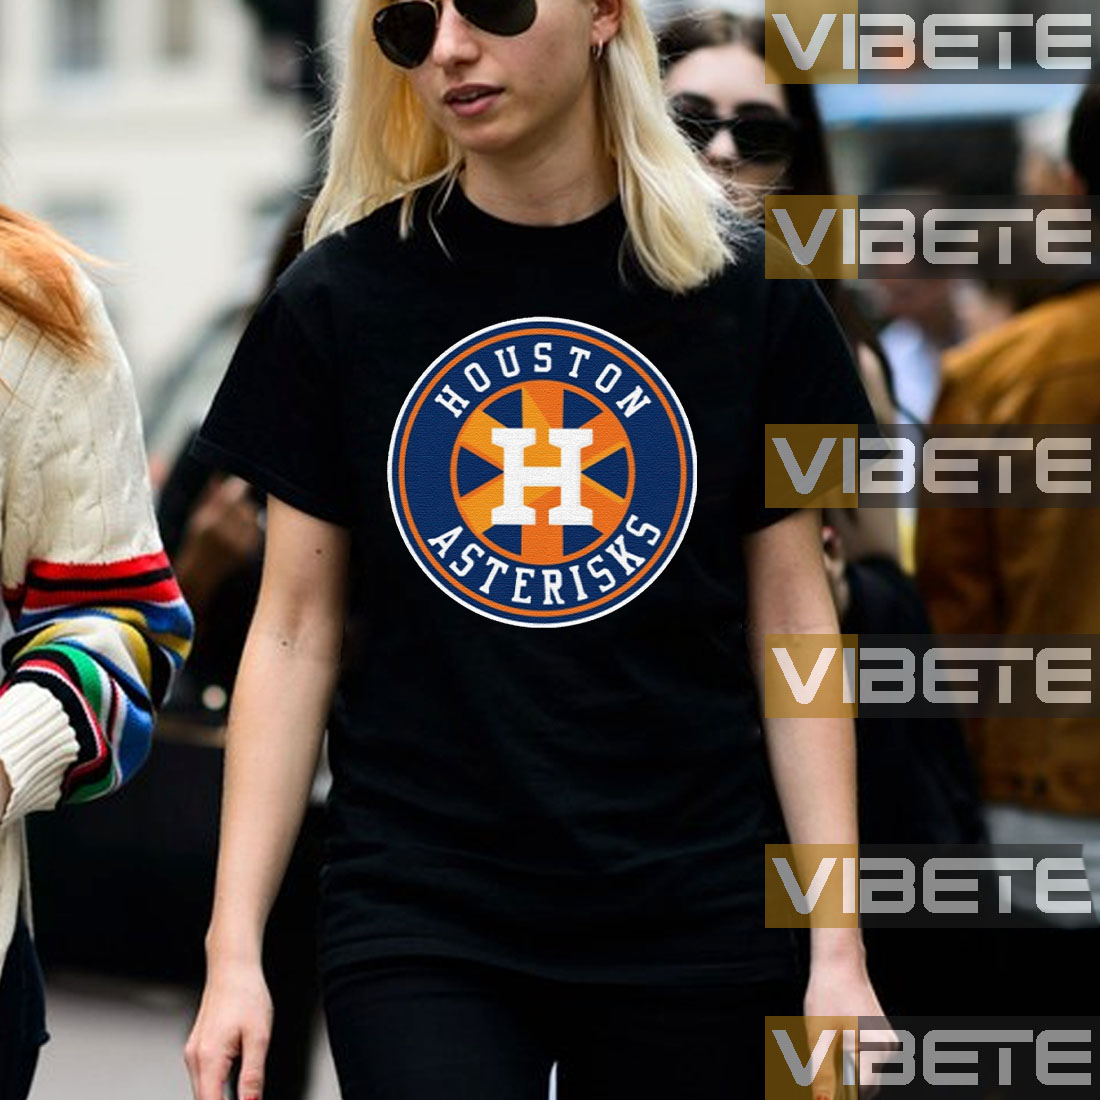 houston asterisks shirt